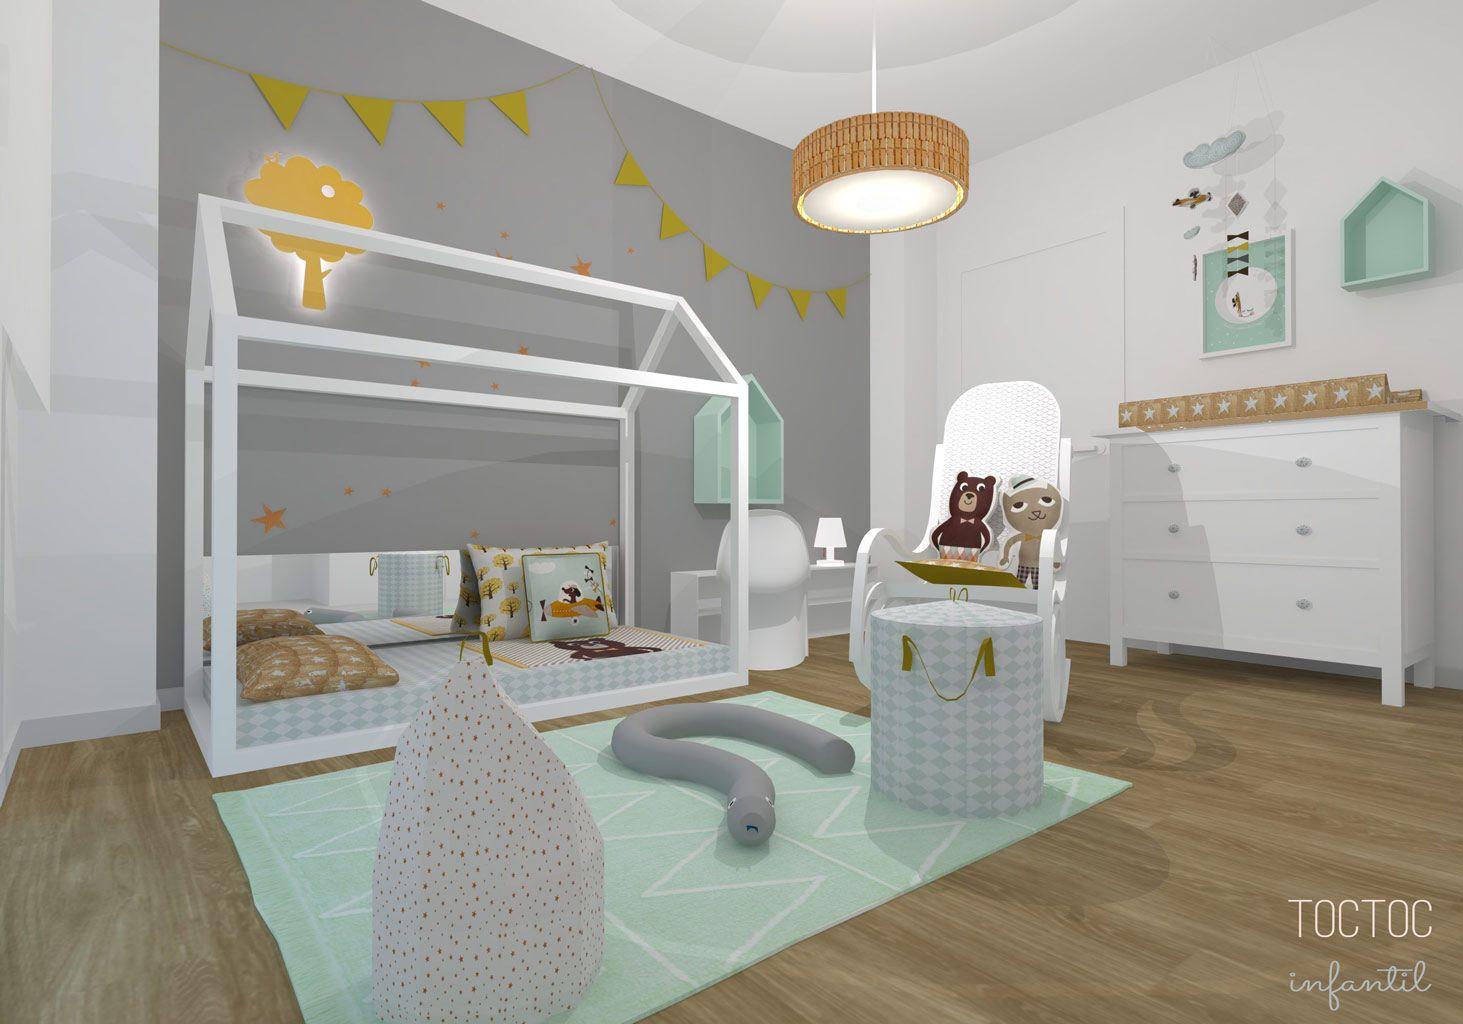 Montessori mint y mostaza toc toc infantil http www for Cuartos montessori para ninas